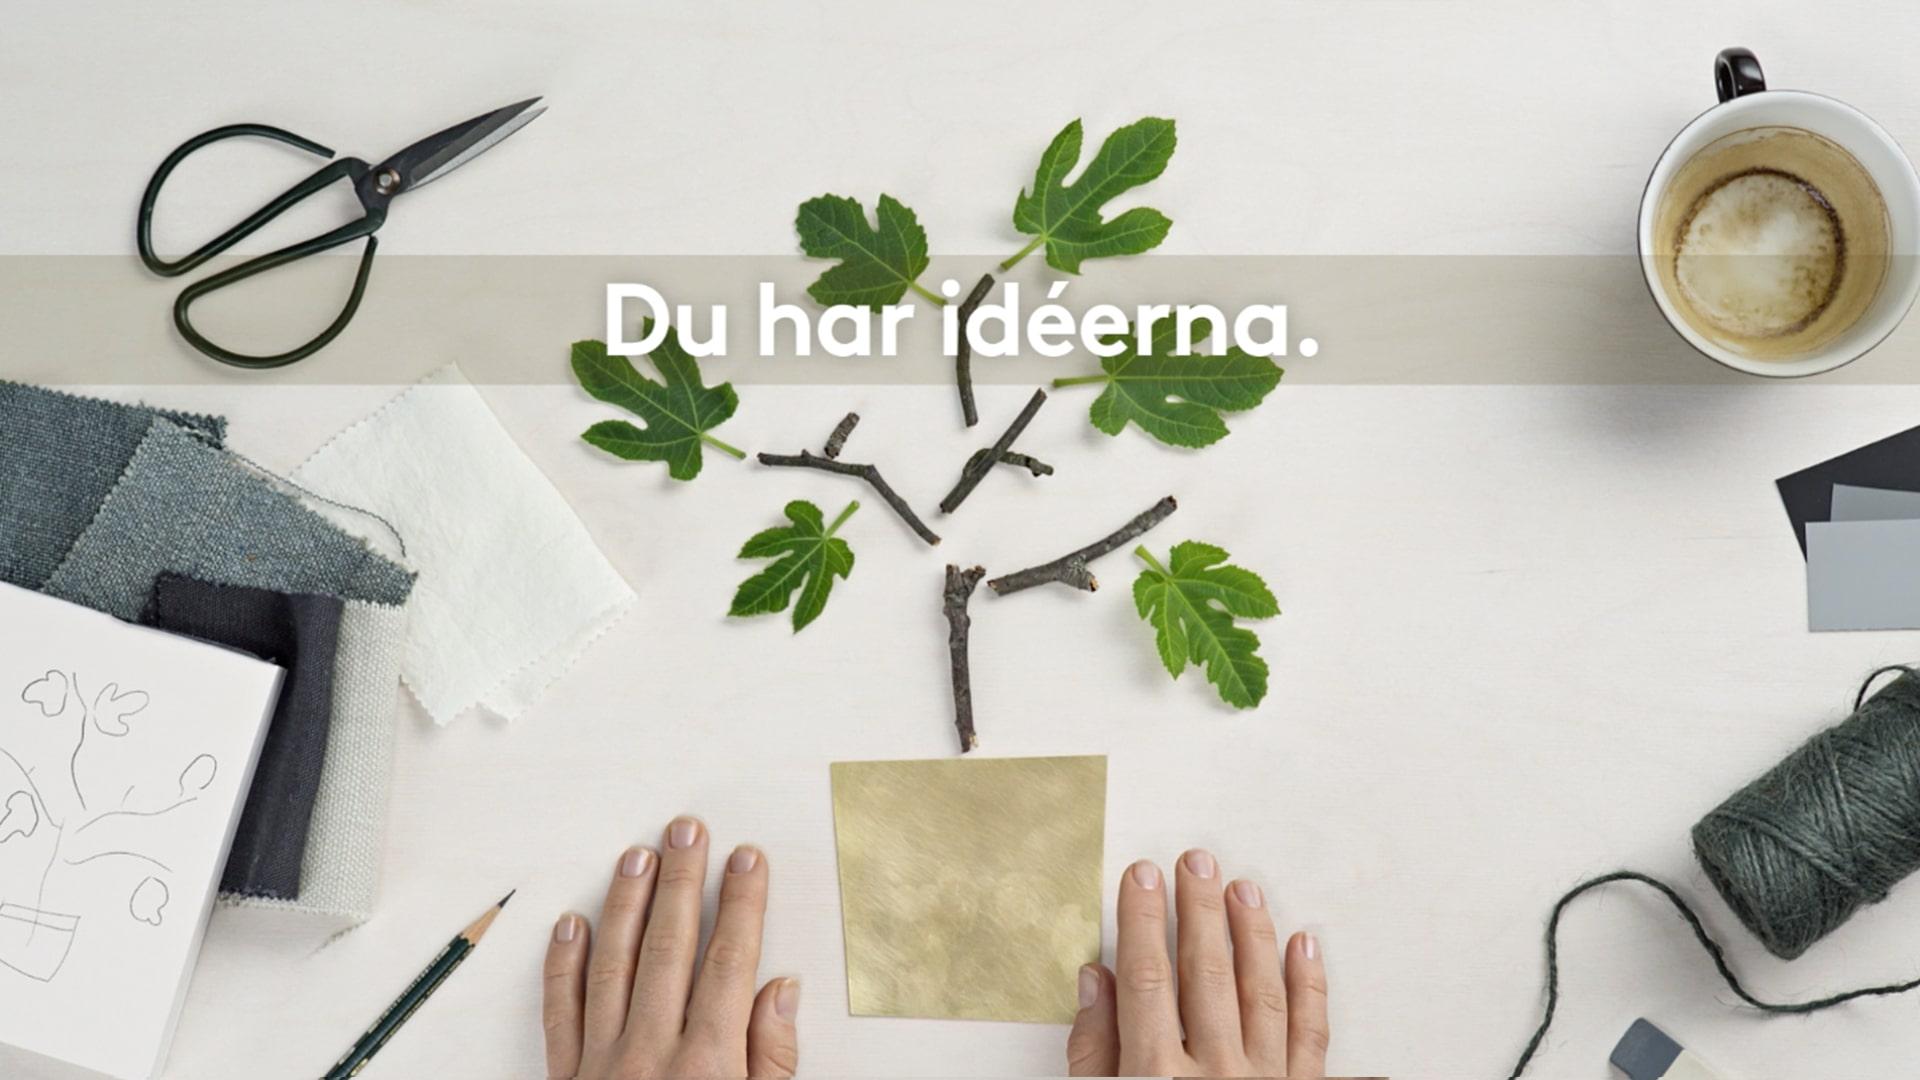 produktions bolag stockholm animation